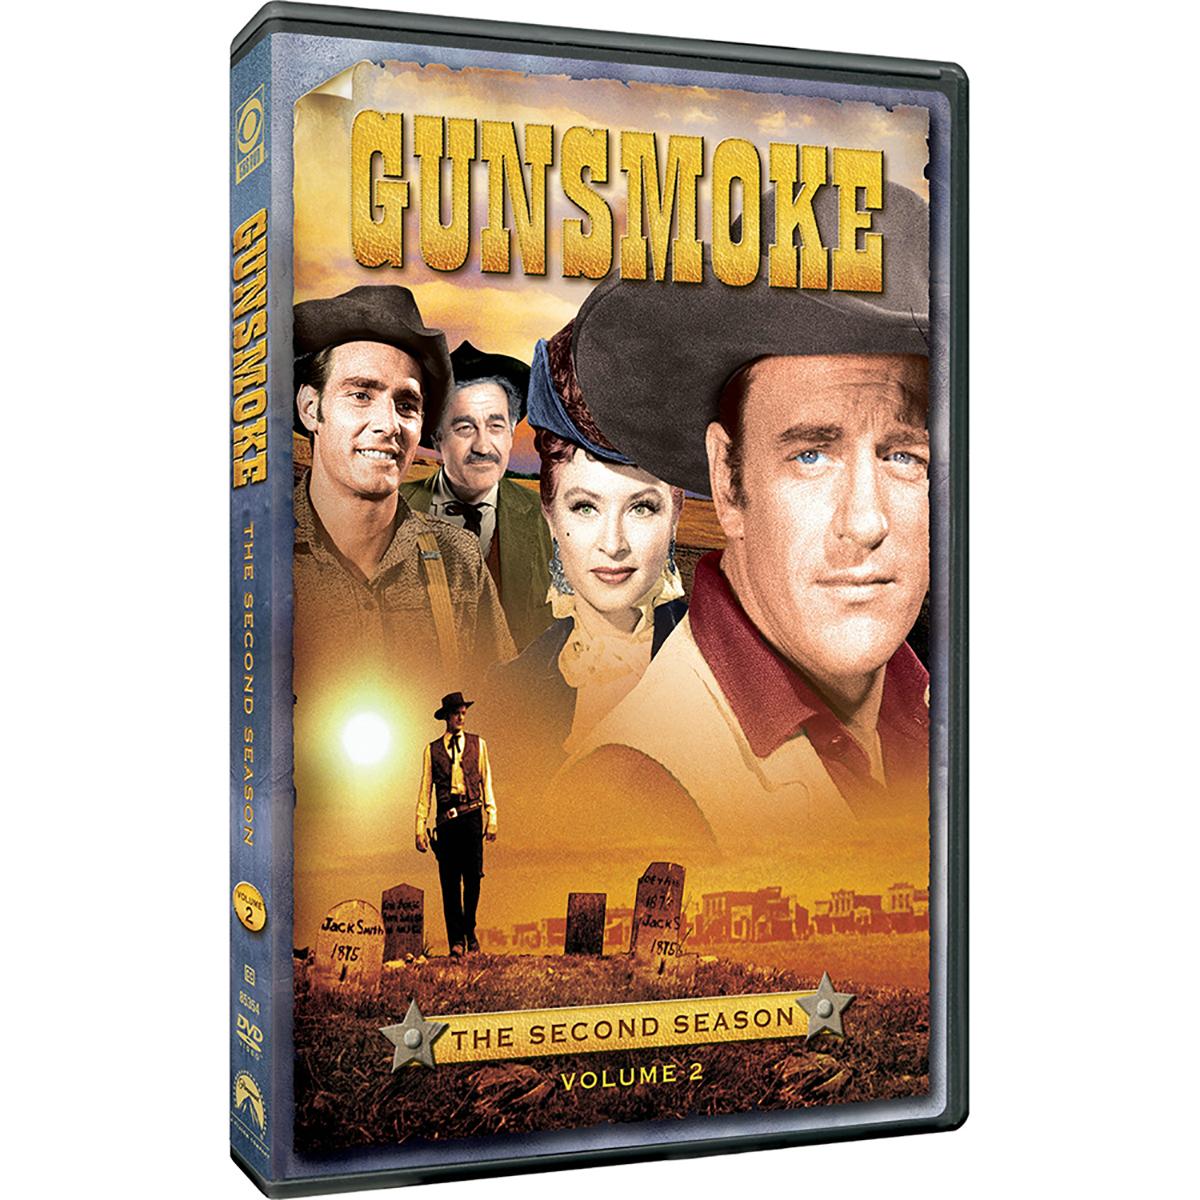 Gunsmoke: Season 2 - Volume 2 DVD -  DVDs & Videos 192-65695